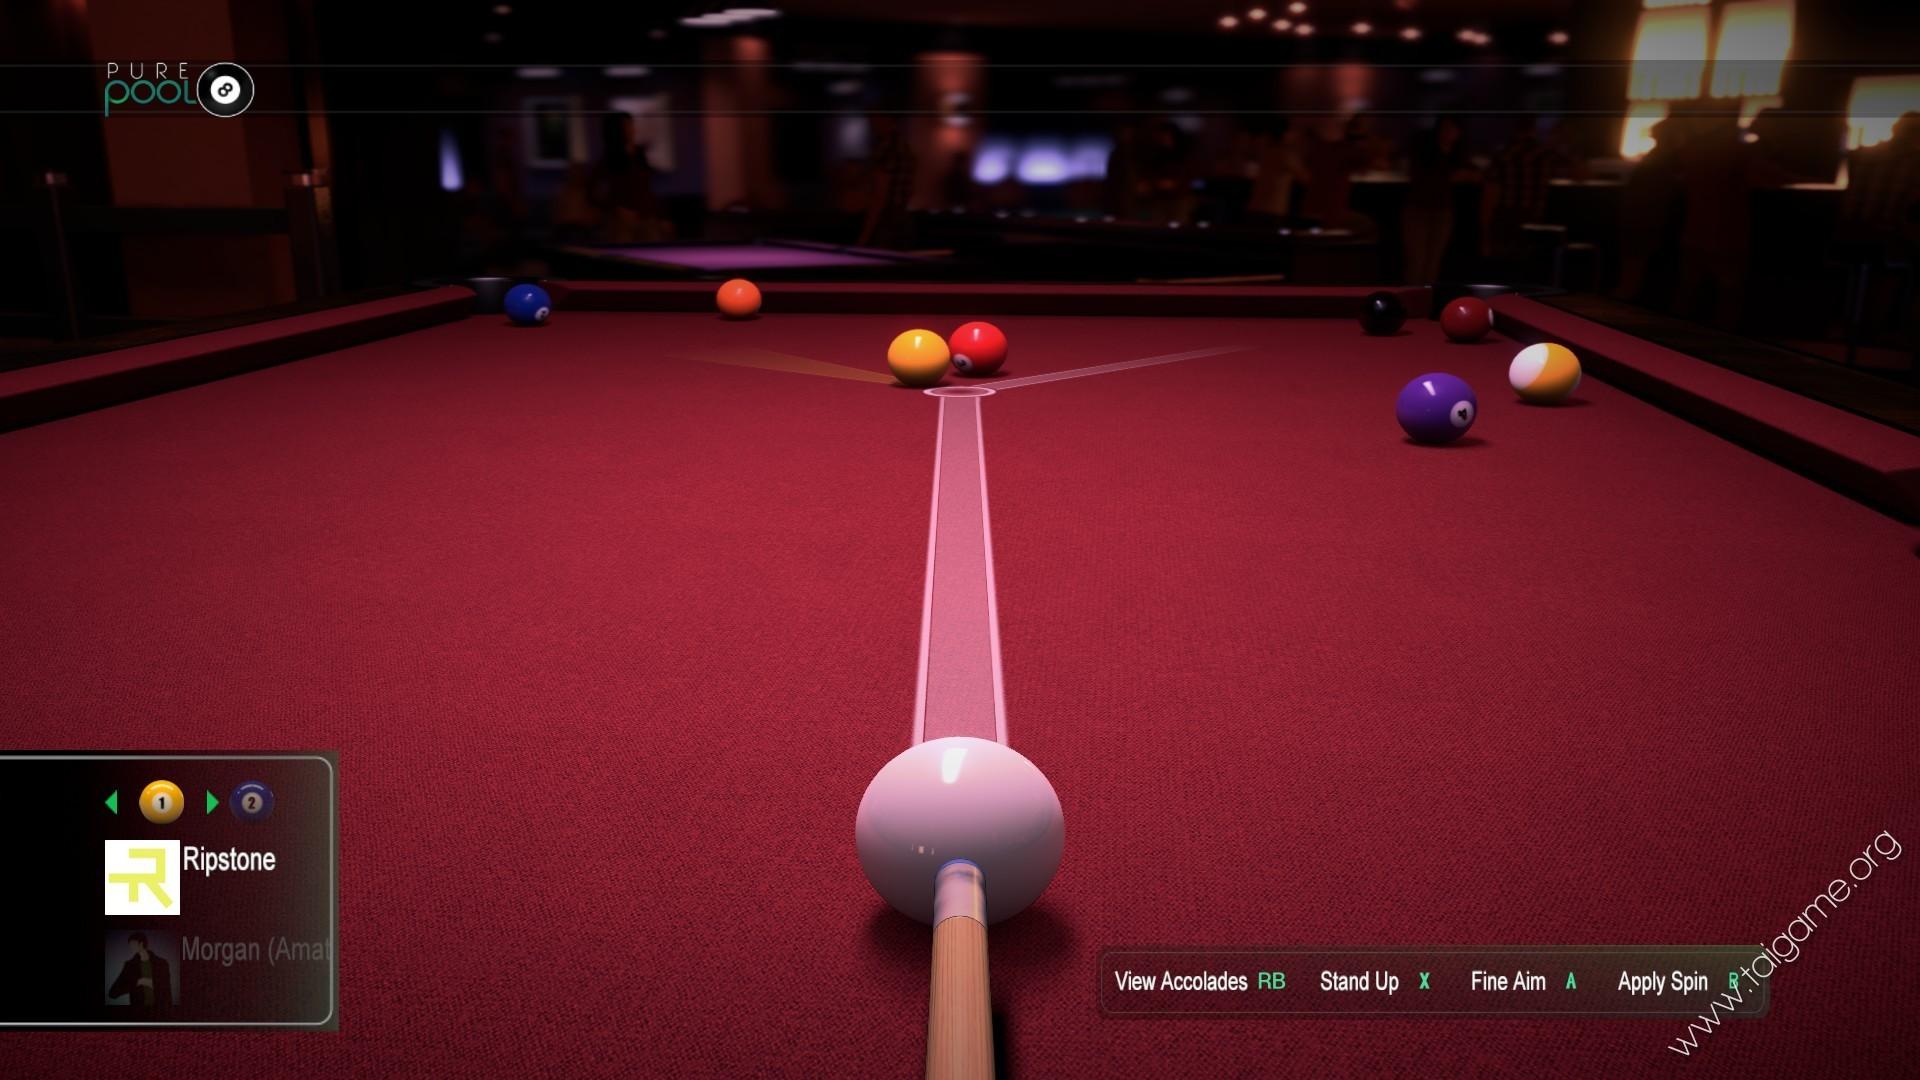 8 Ball Pool Multiplayer  Games at Miniclipcom